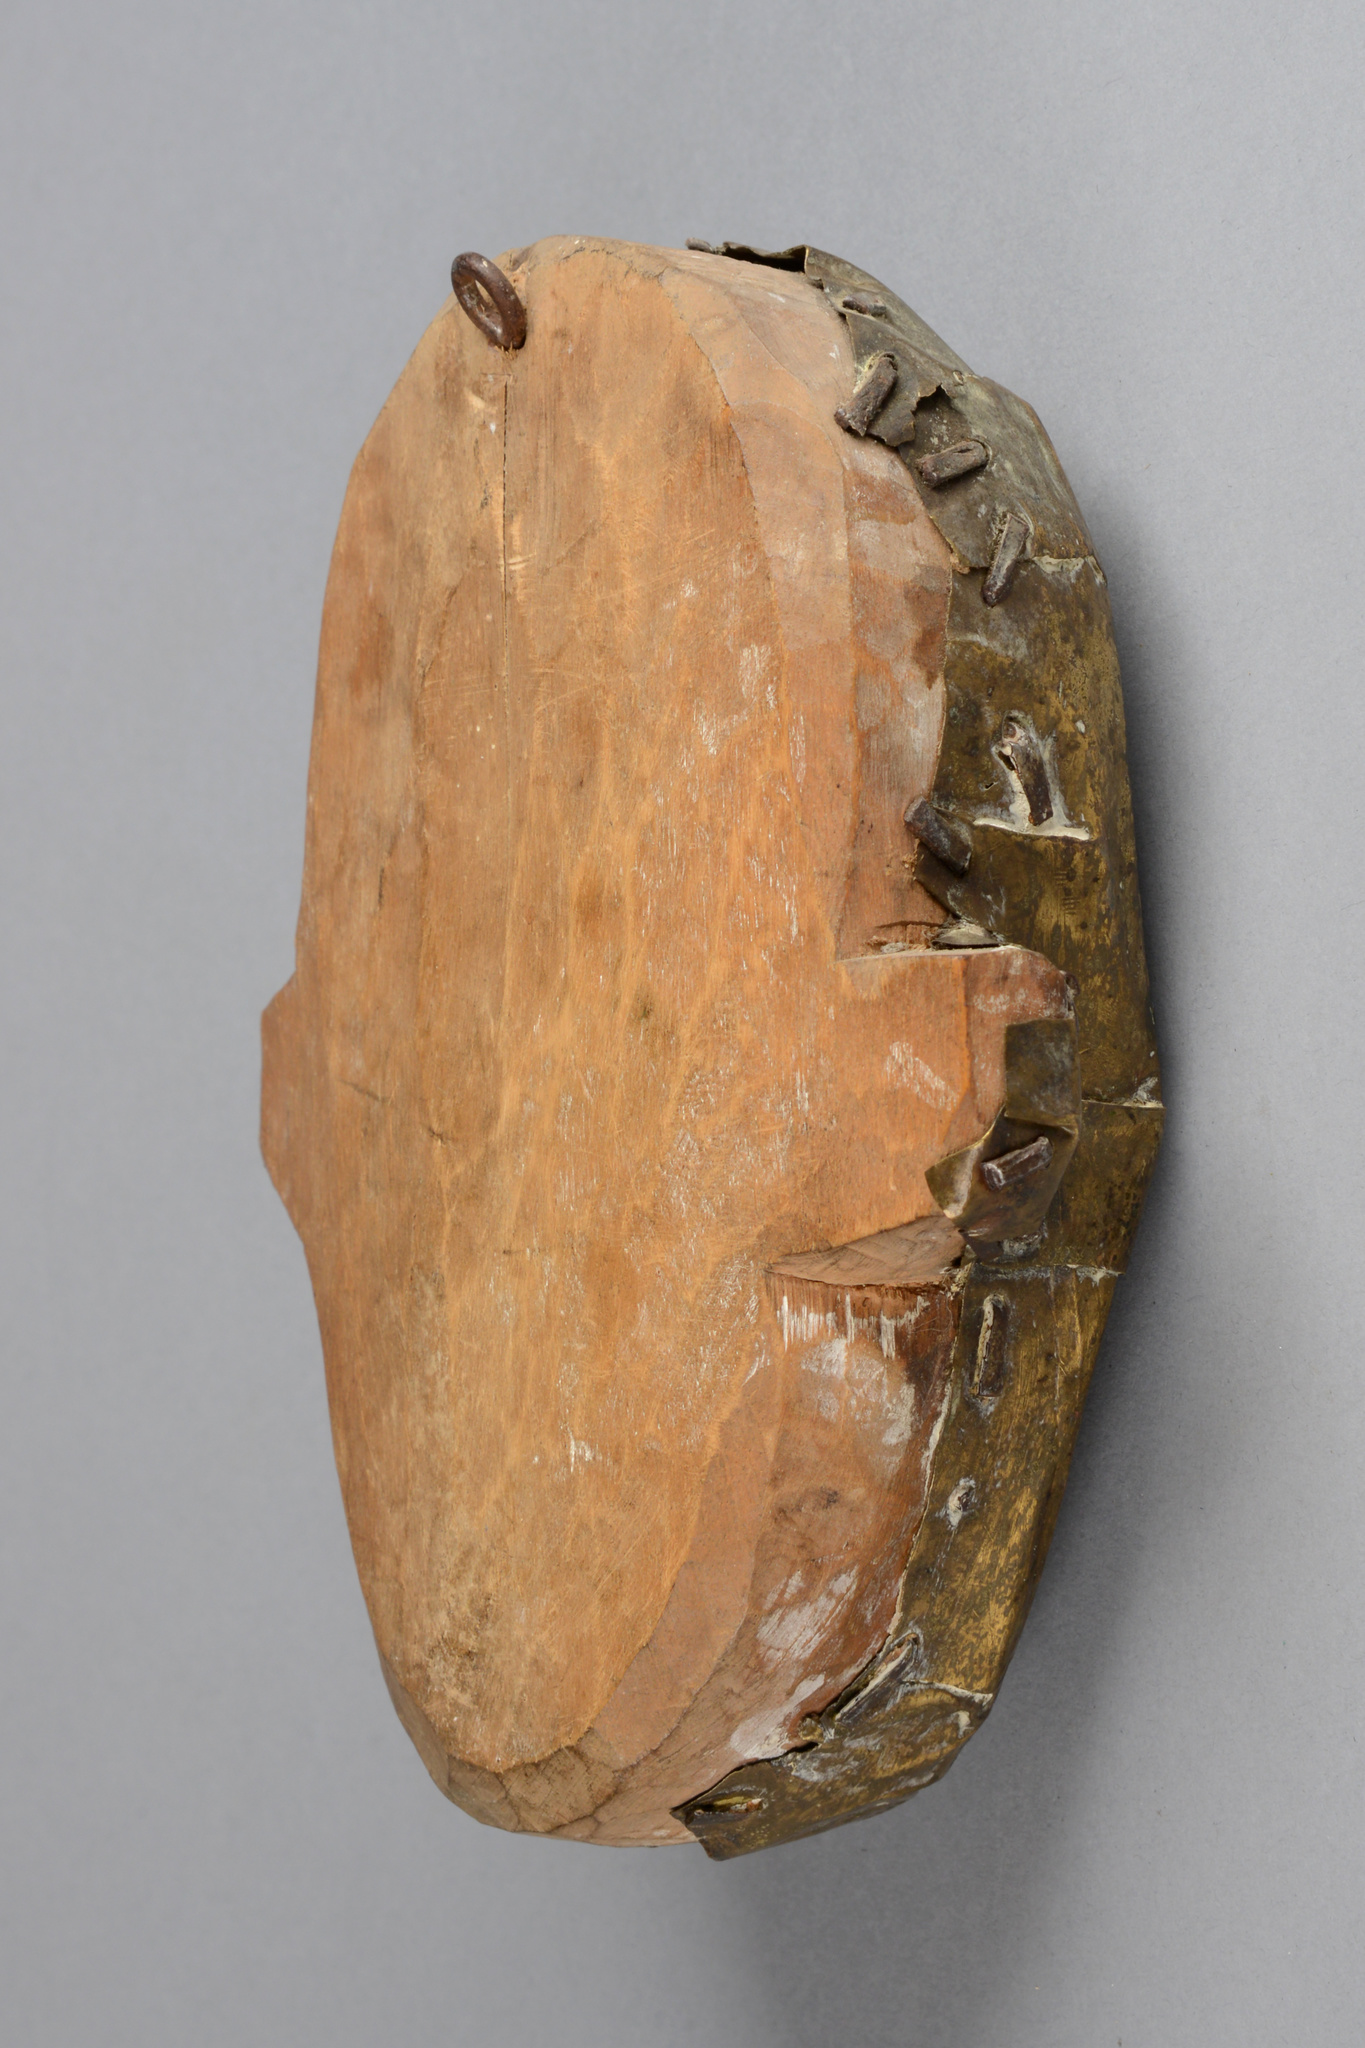 Mask-like head sculpture